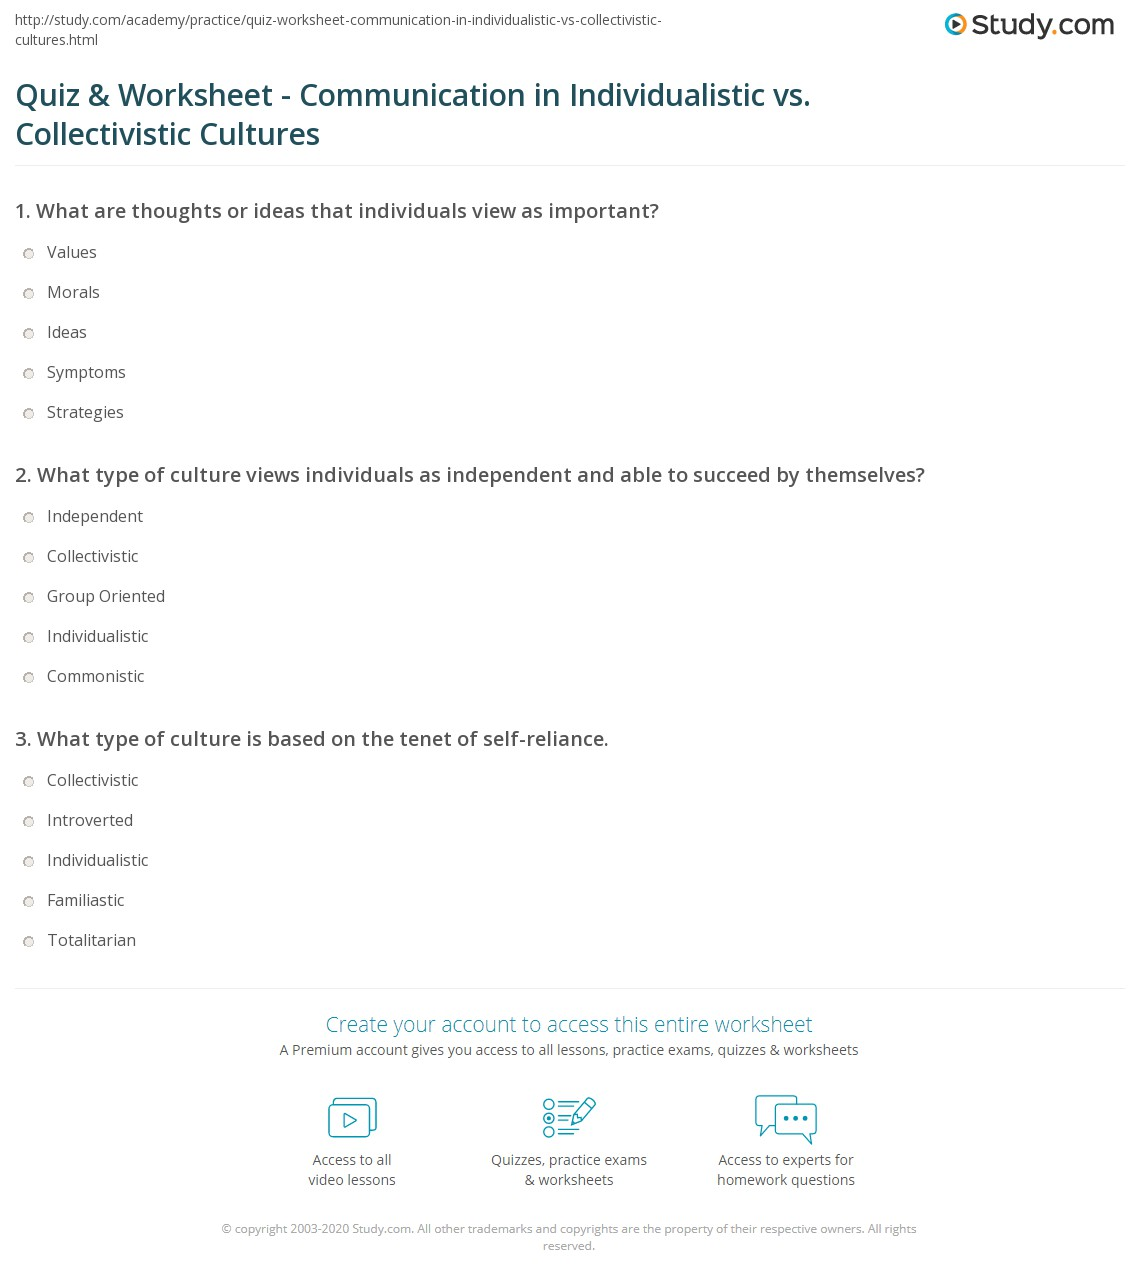 quiz worksheet communication in individualistic vs collectivistic cultures. Black Bedroom Furniture Sets. Home Design Ideas